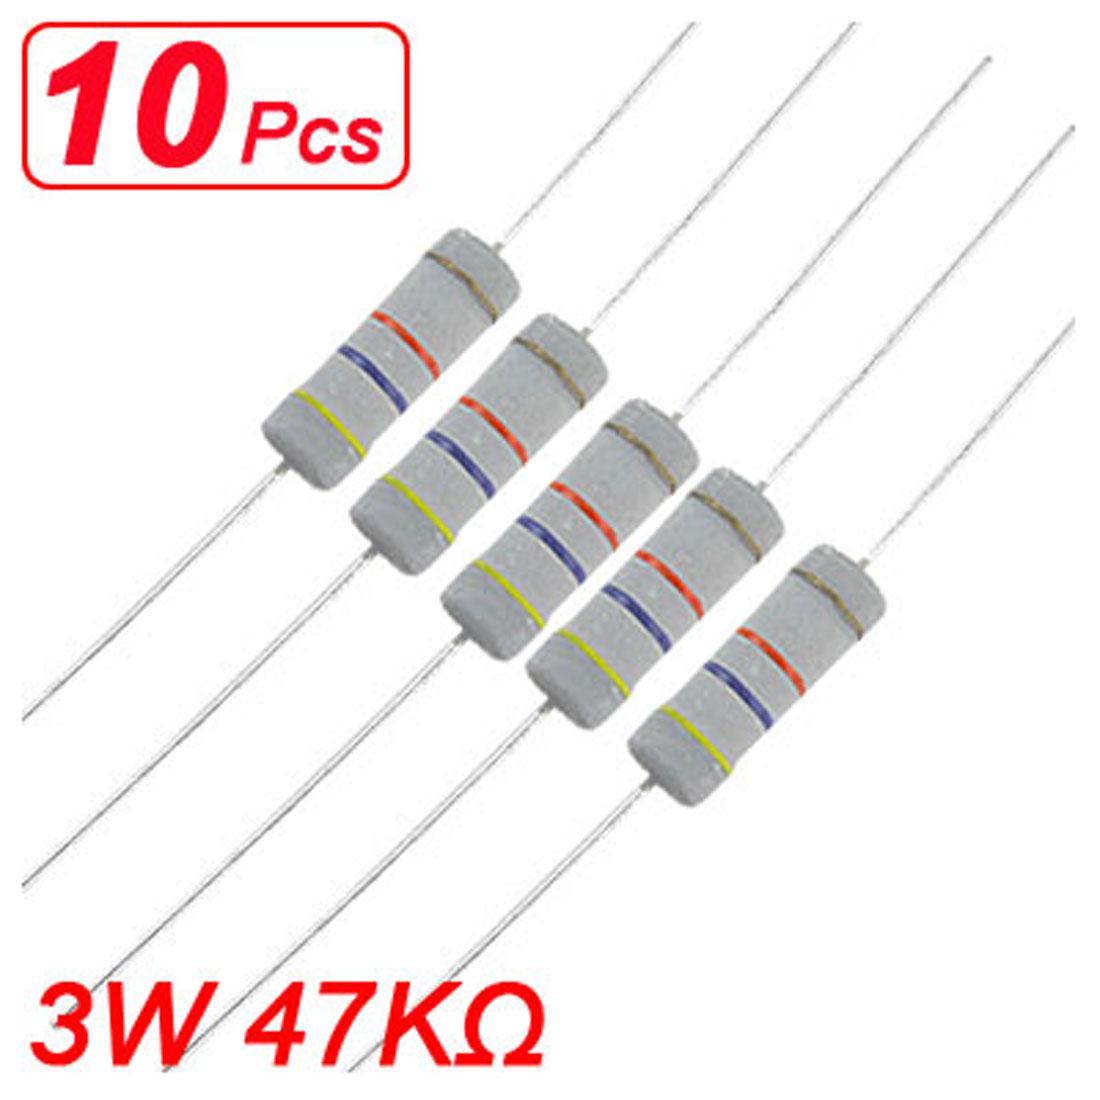 10 x 3W 500V 47K ohm Metal Oxide Film Resistors Axial Lead